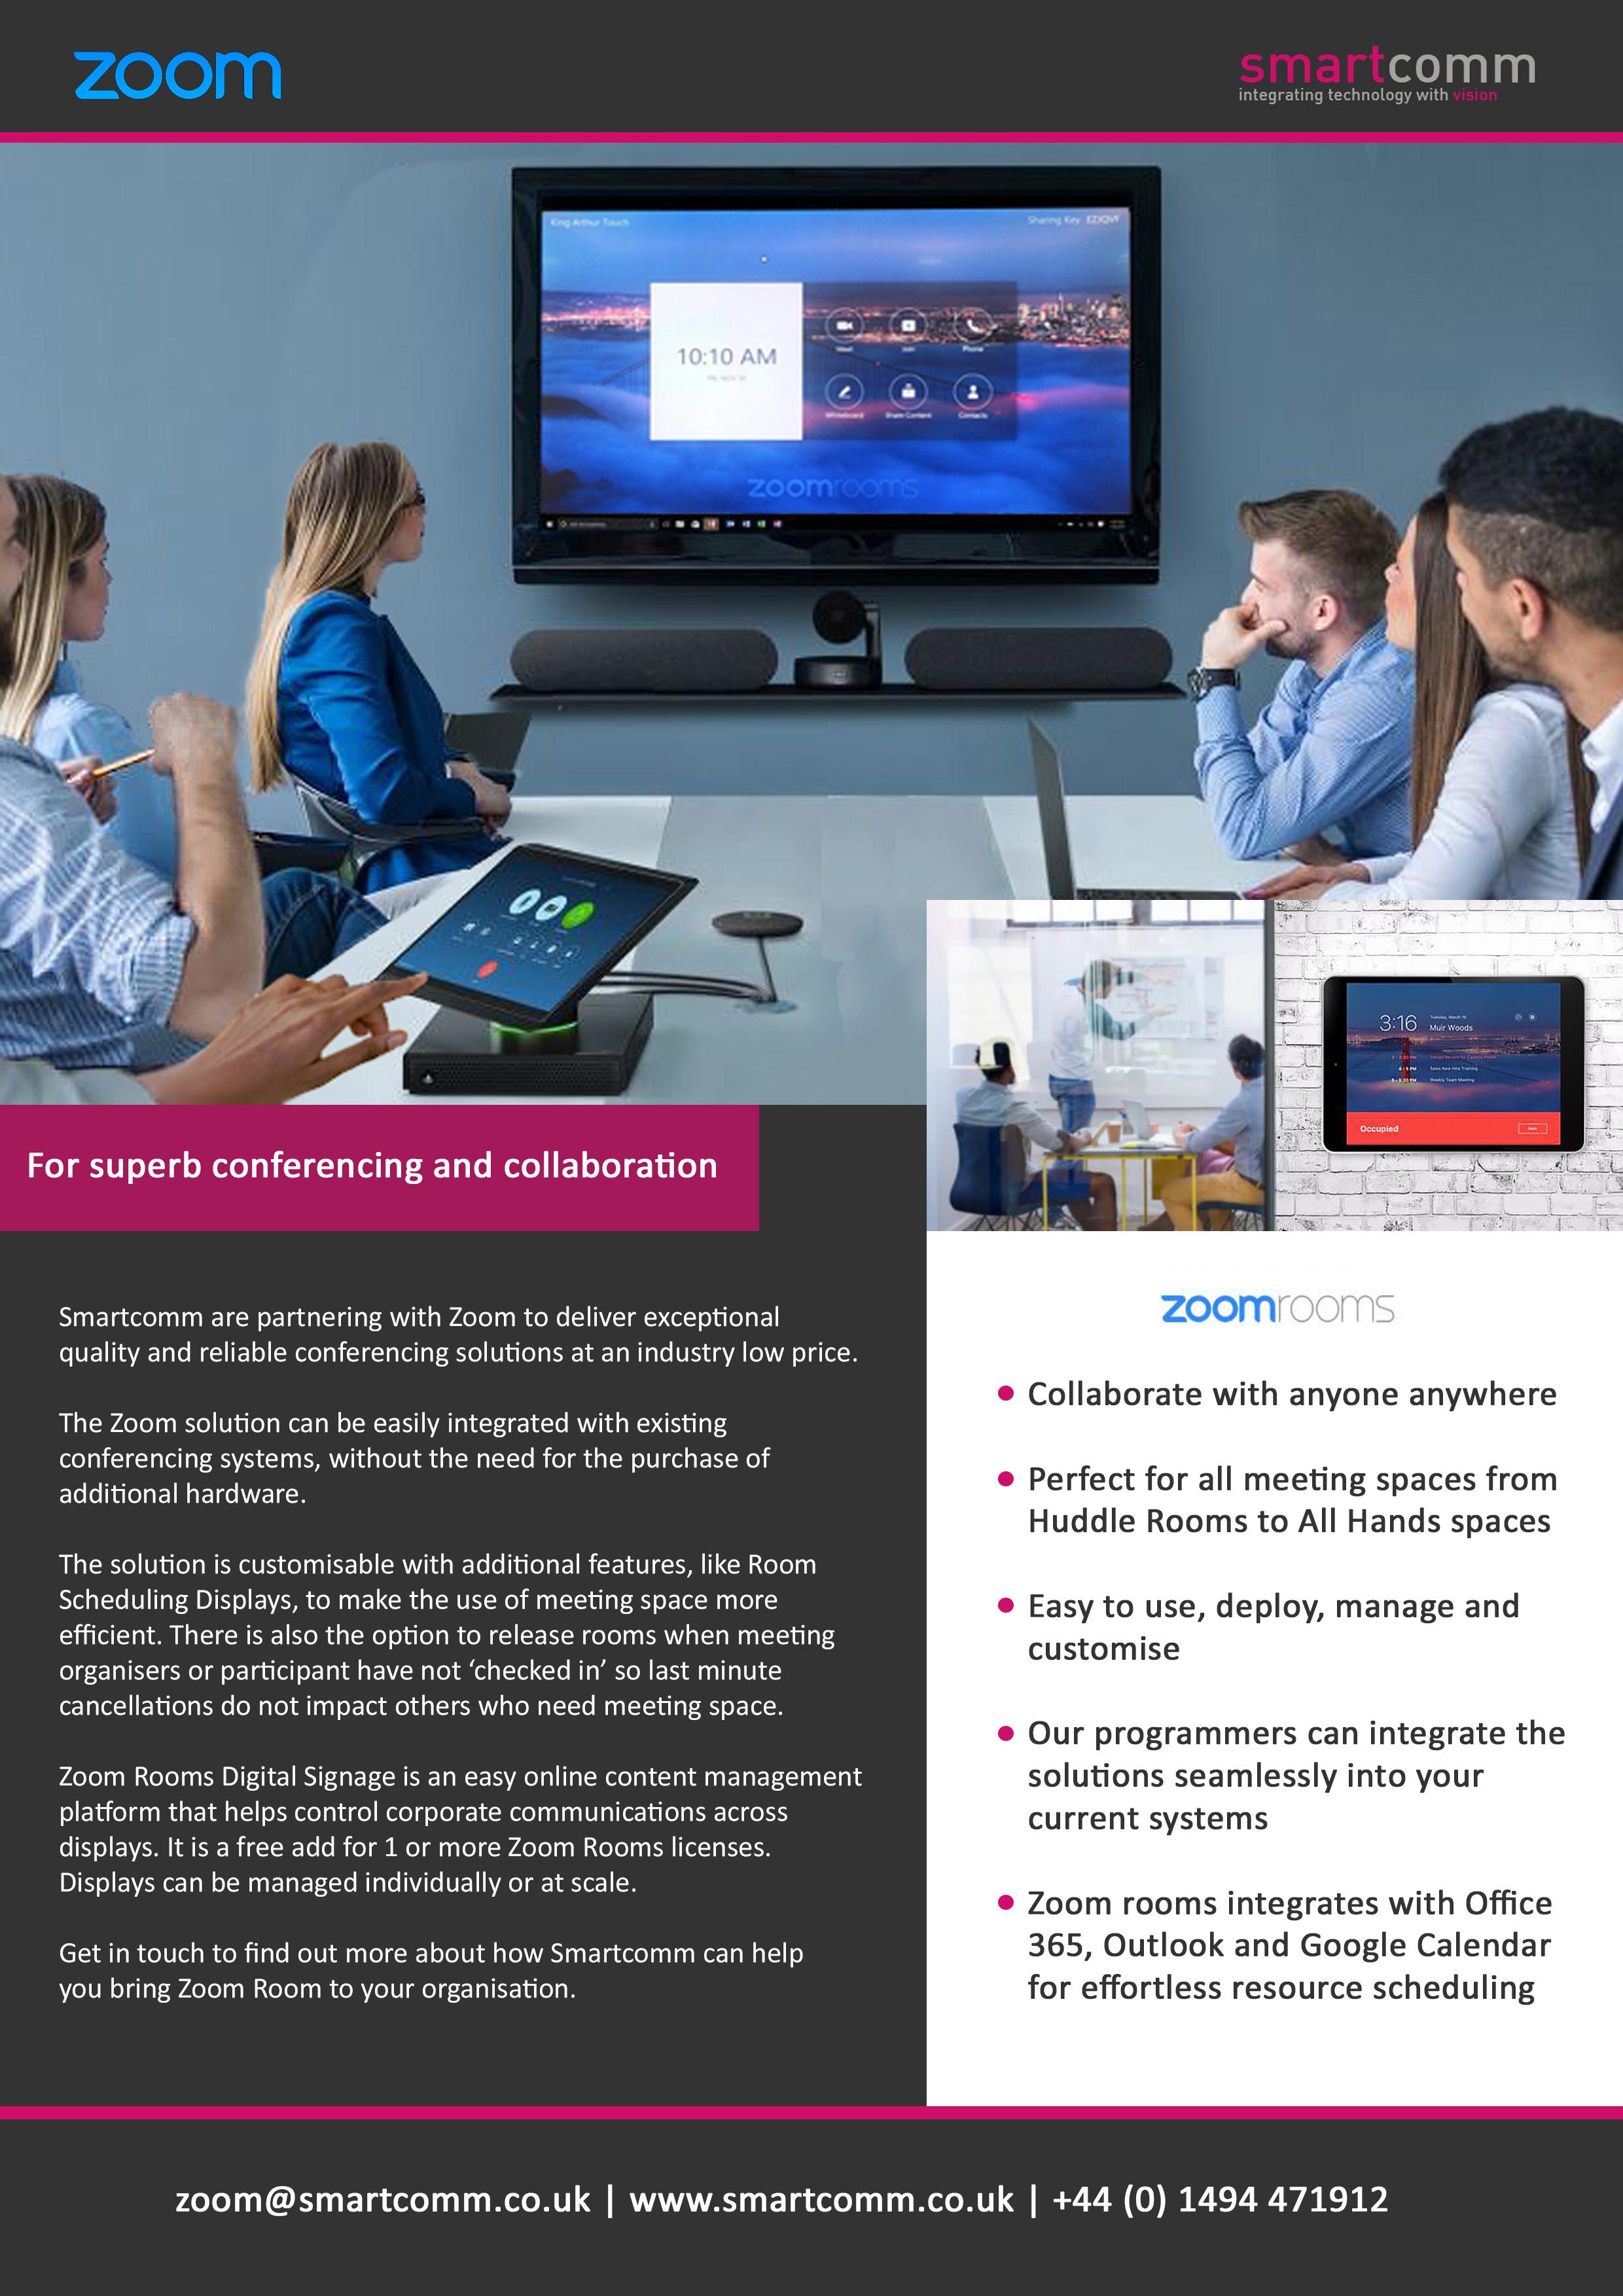 Smartcomm Zoom Partnership